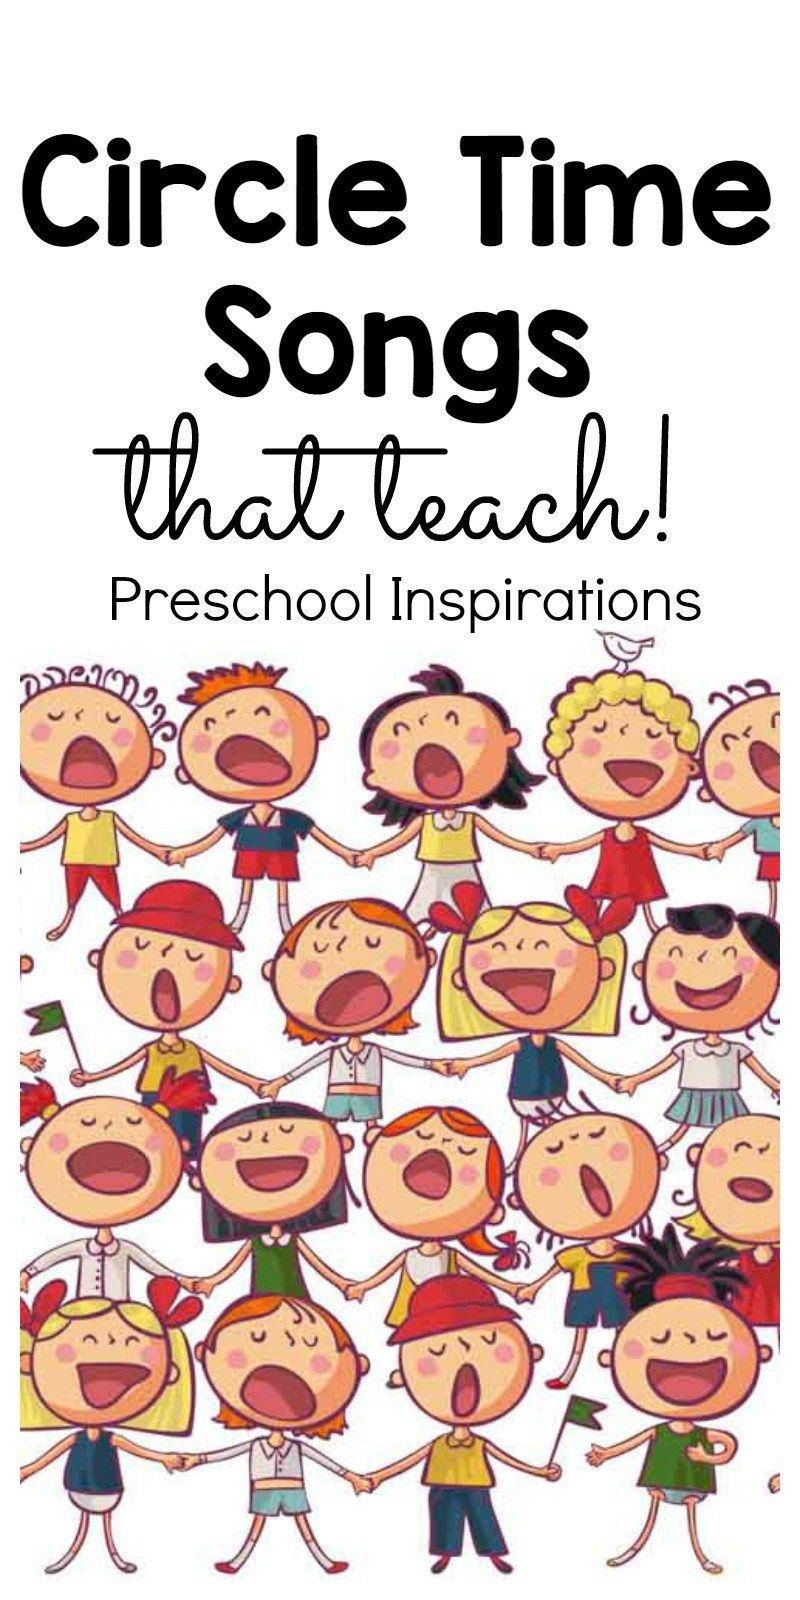 Preschool Songs For Circle Time 画像あり 教育 学習 英語学習